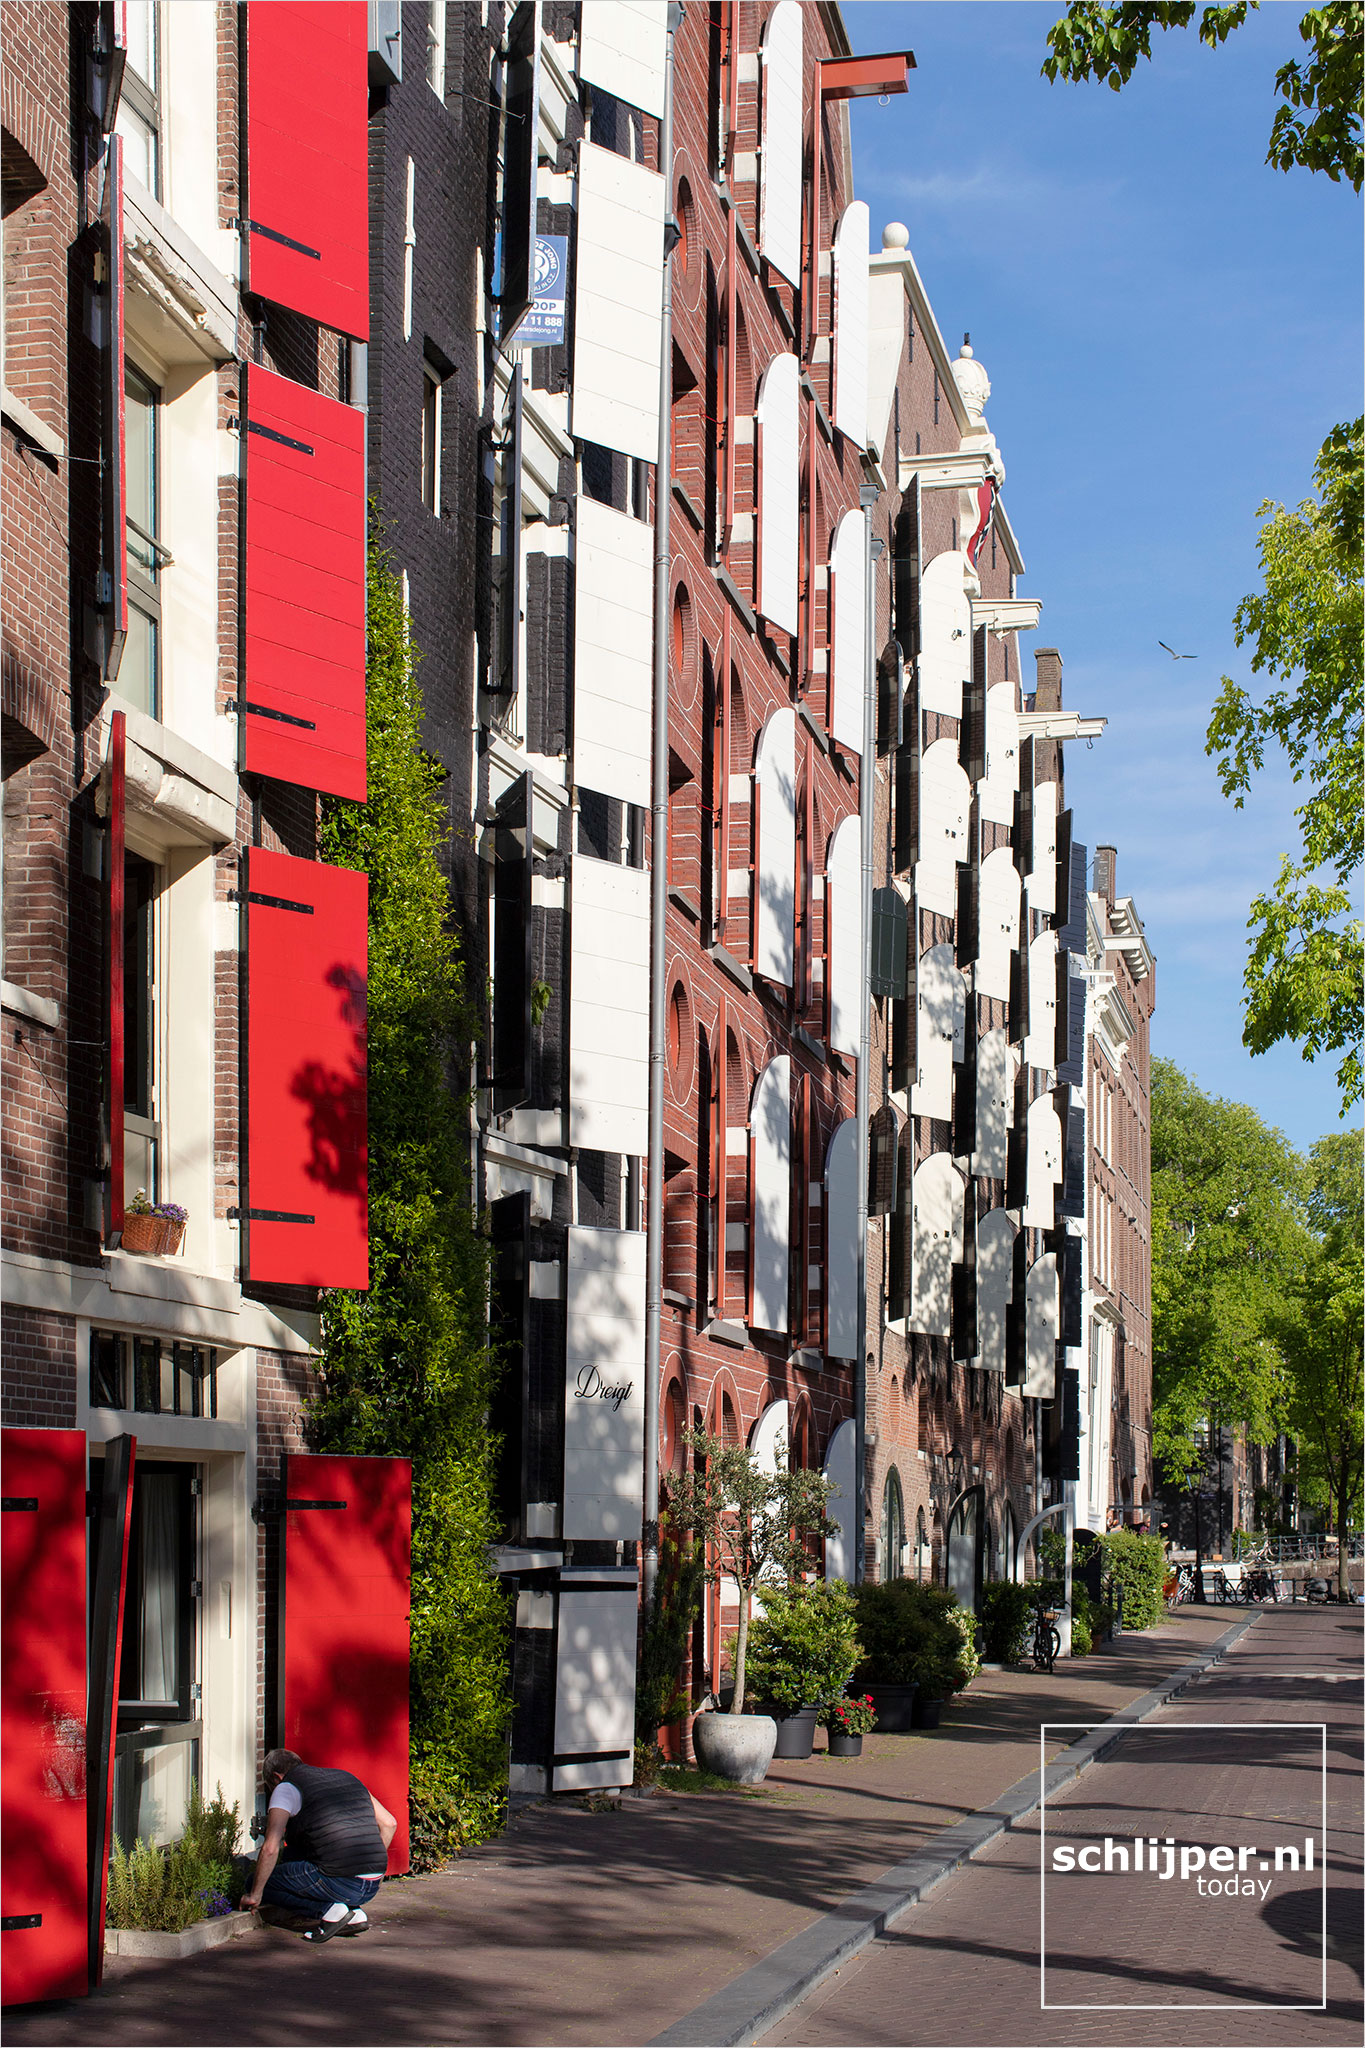 Nederland, Amsterdam, 18 mei 2020